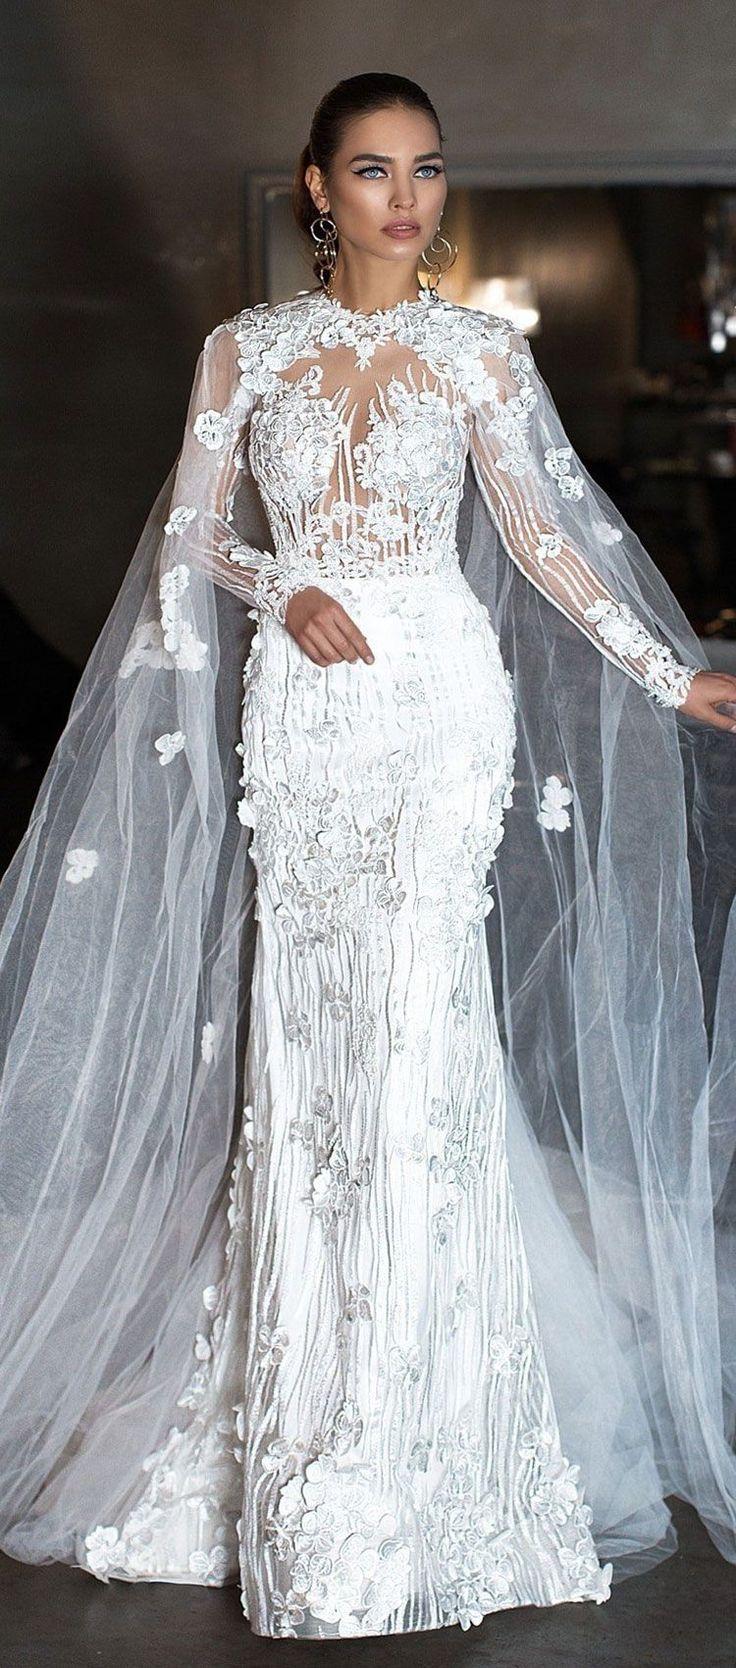 Fully embellishment tulle cape with sleeves fit and flare wedding dress #wedding #weddings #weddinggown #bridedress #weddingdress